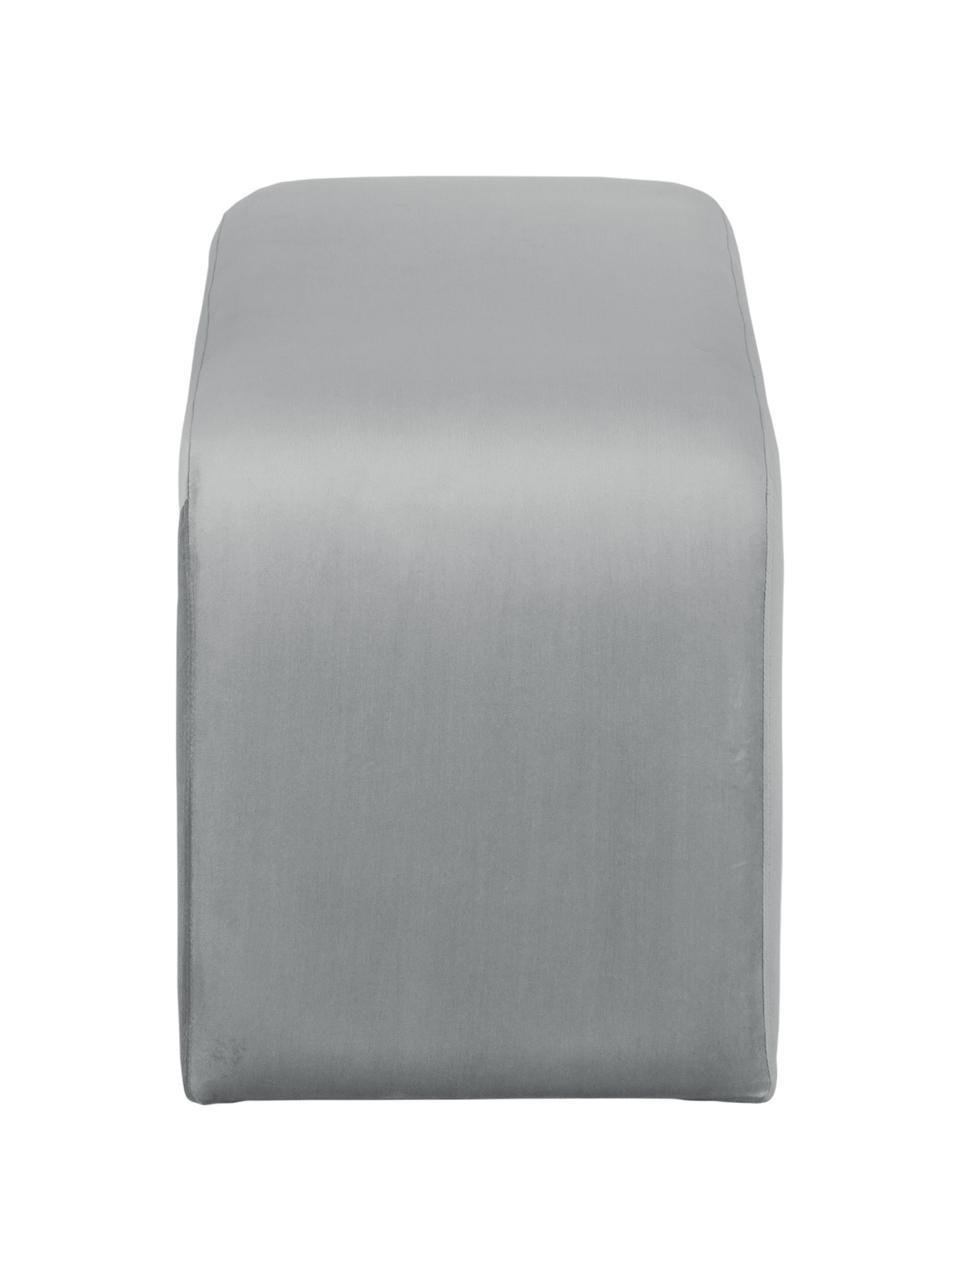 Panca imbottita in velluto Penelope, Rivestimento: velluto (poliestere) 25.0, Struttura: metallo truciolato, Grigio, Larg. 110 x Alt. 46 cm